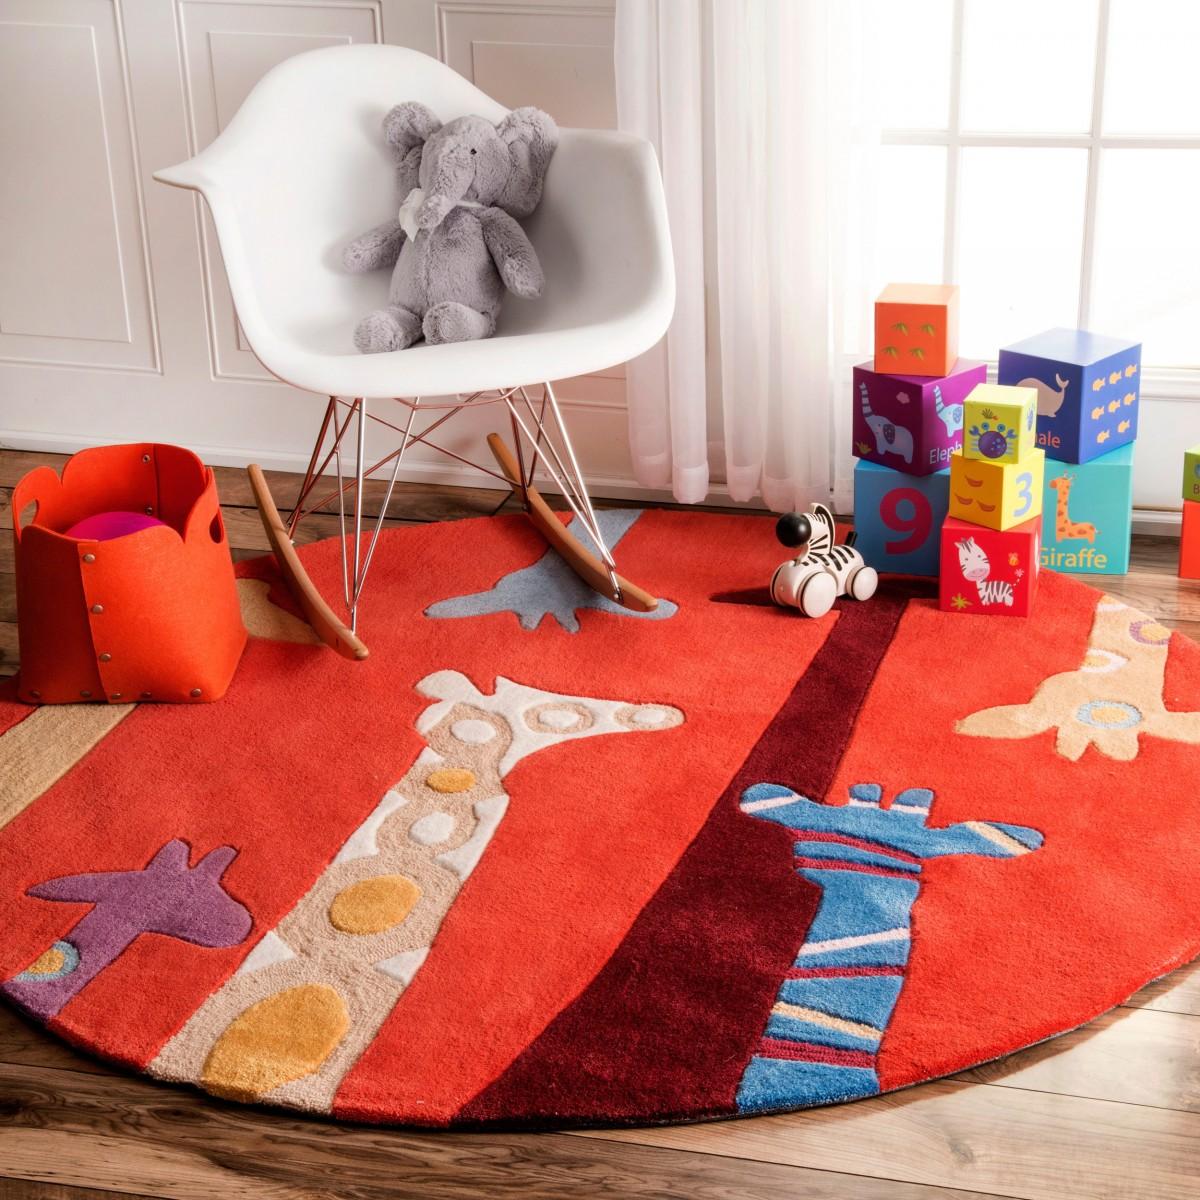 nuLOOM-Handmade-Bright-Giraffes-Kids-Nursery-Red-Rug-5-Round-f804dca5-24a8-4420-a10a-32bd6ec81733